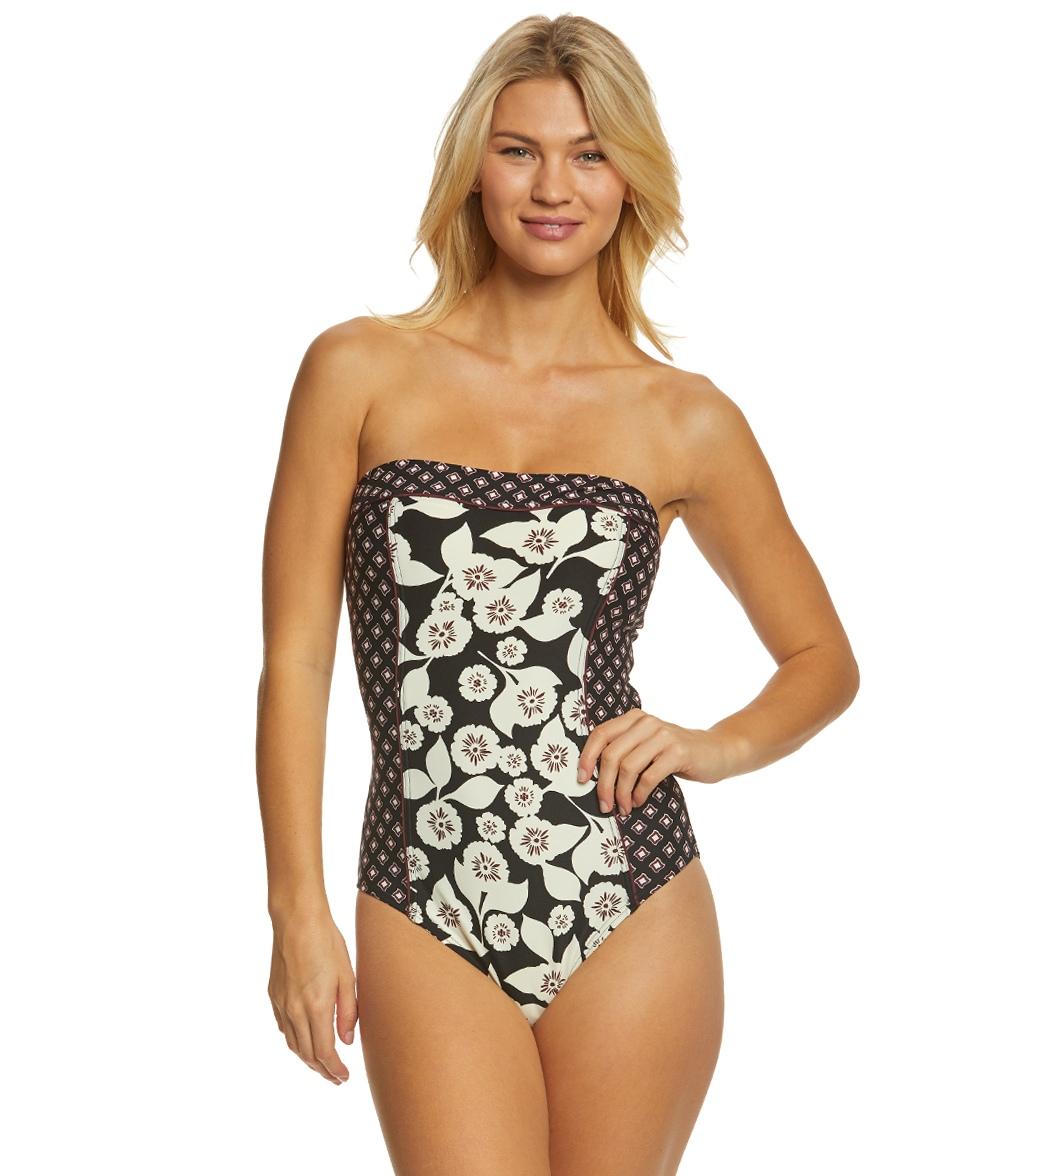 726cbd80c6d ... Kate Spade New York Aliso Beach Bandeau One Piece Swimsuit. Play Video.  MODEL MEASUREMENTS